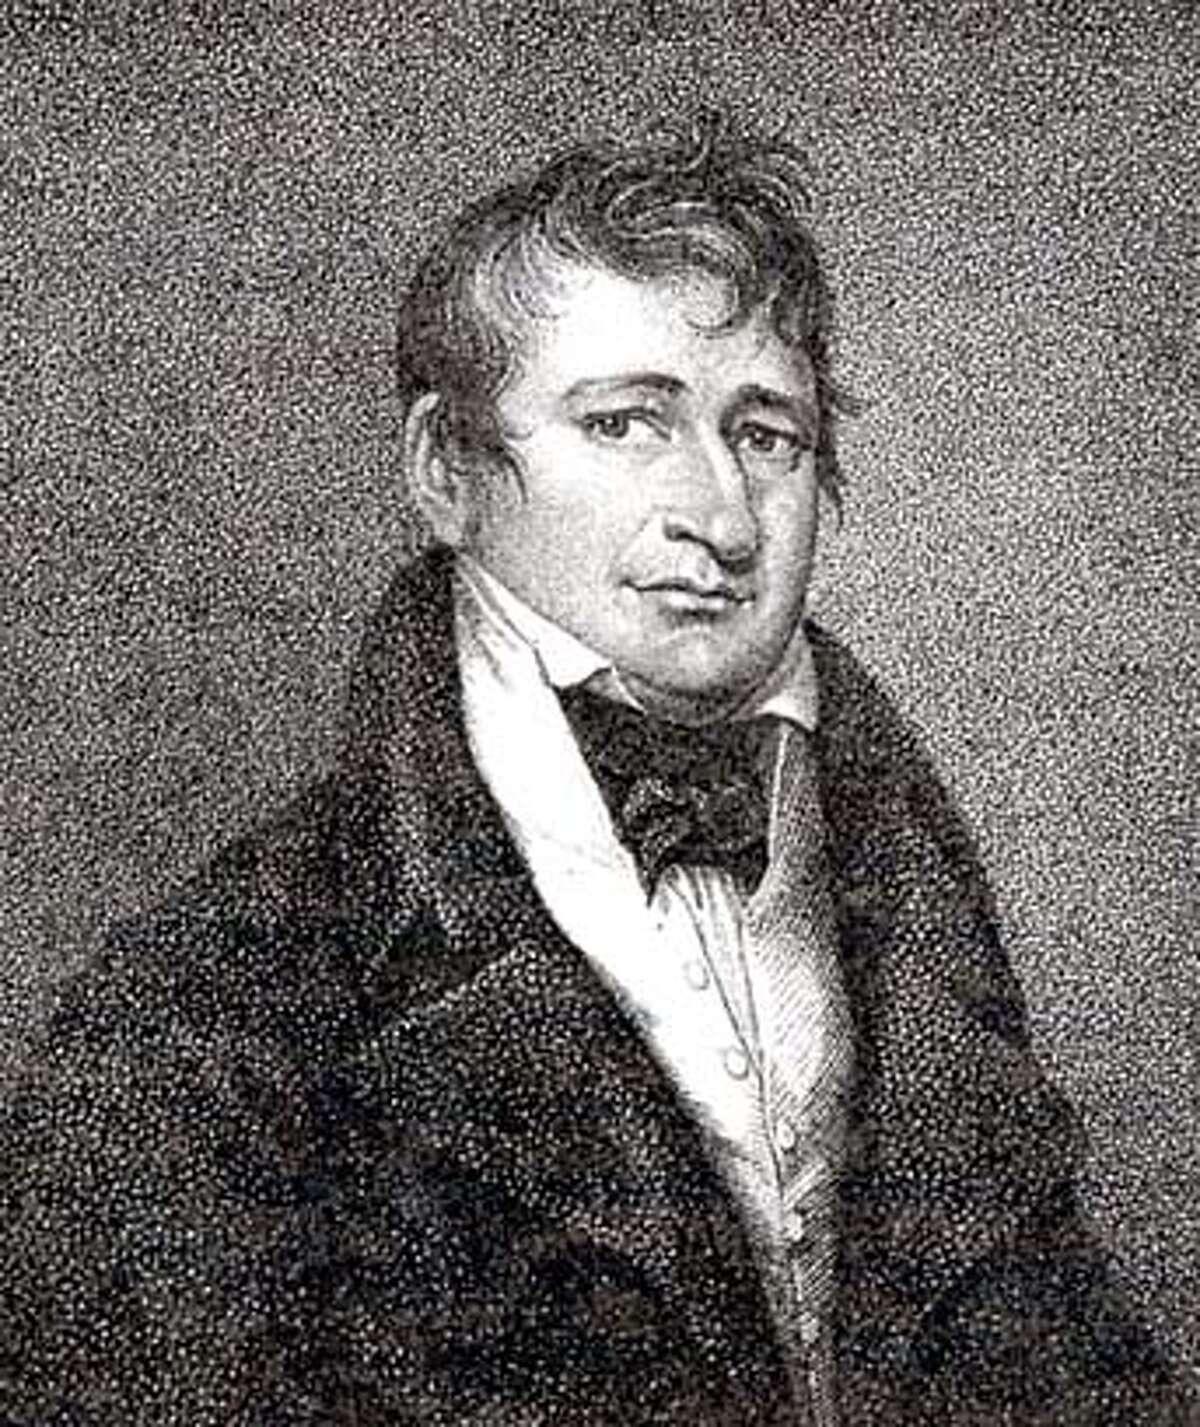 Capt. James Riley